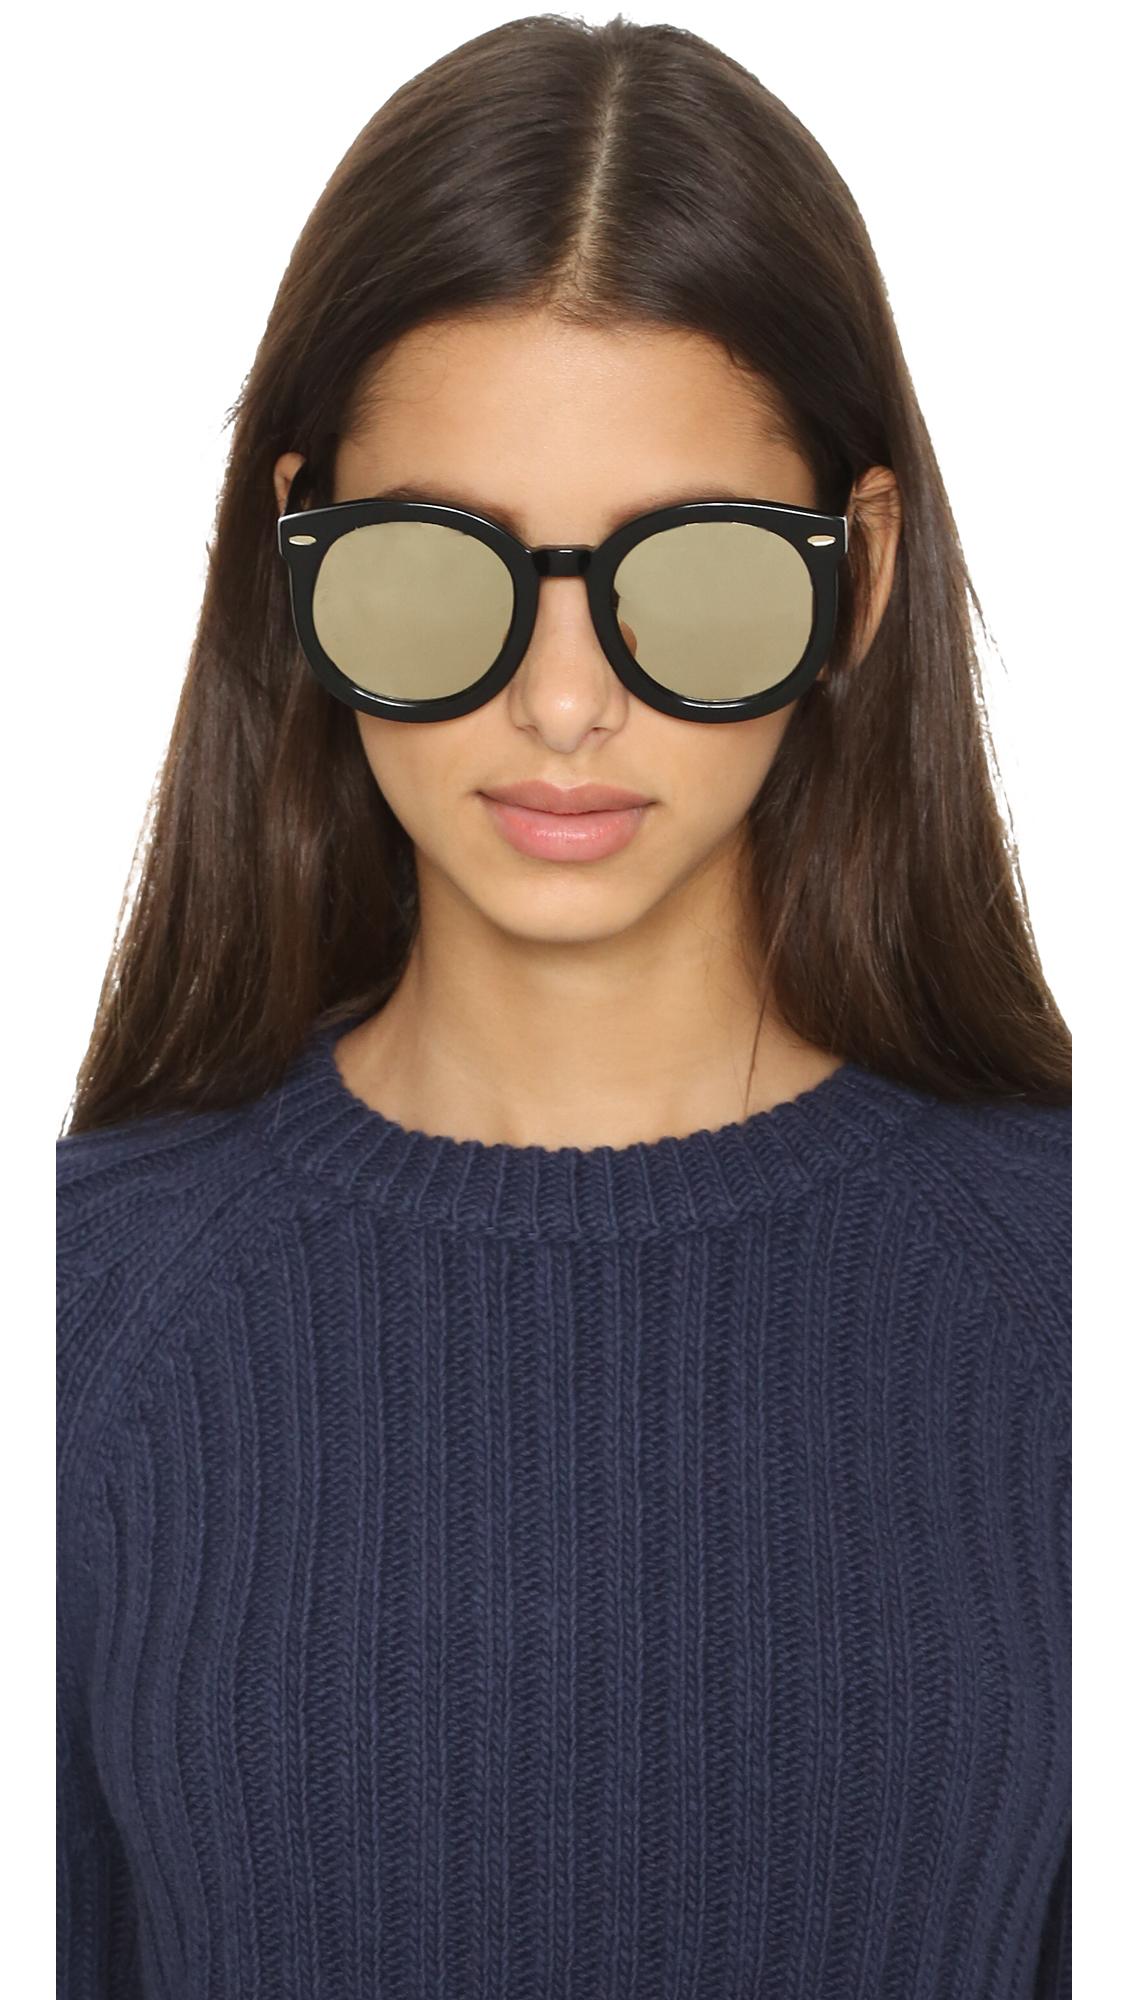 e576555440f Lyst - Karen Walker Superstars Super Duper Strength Sunglasses ...